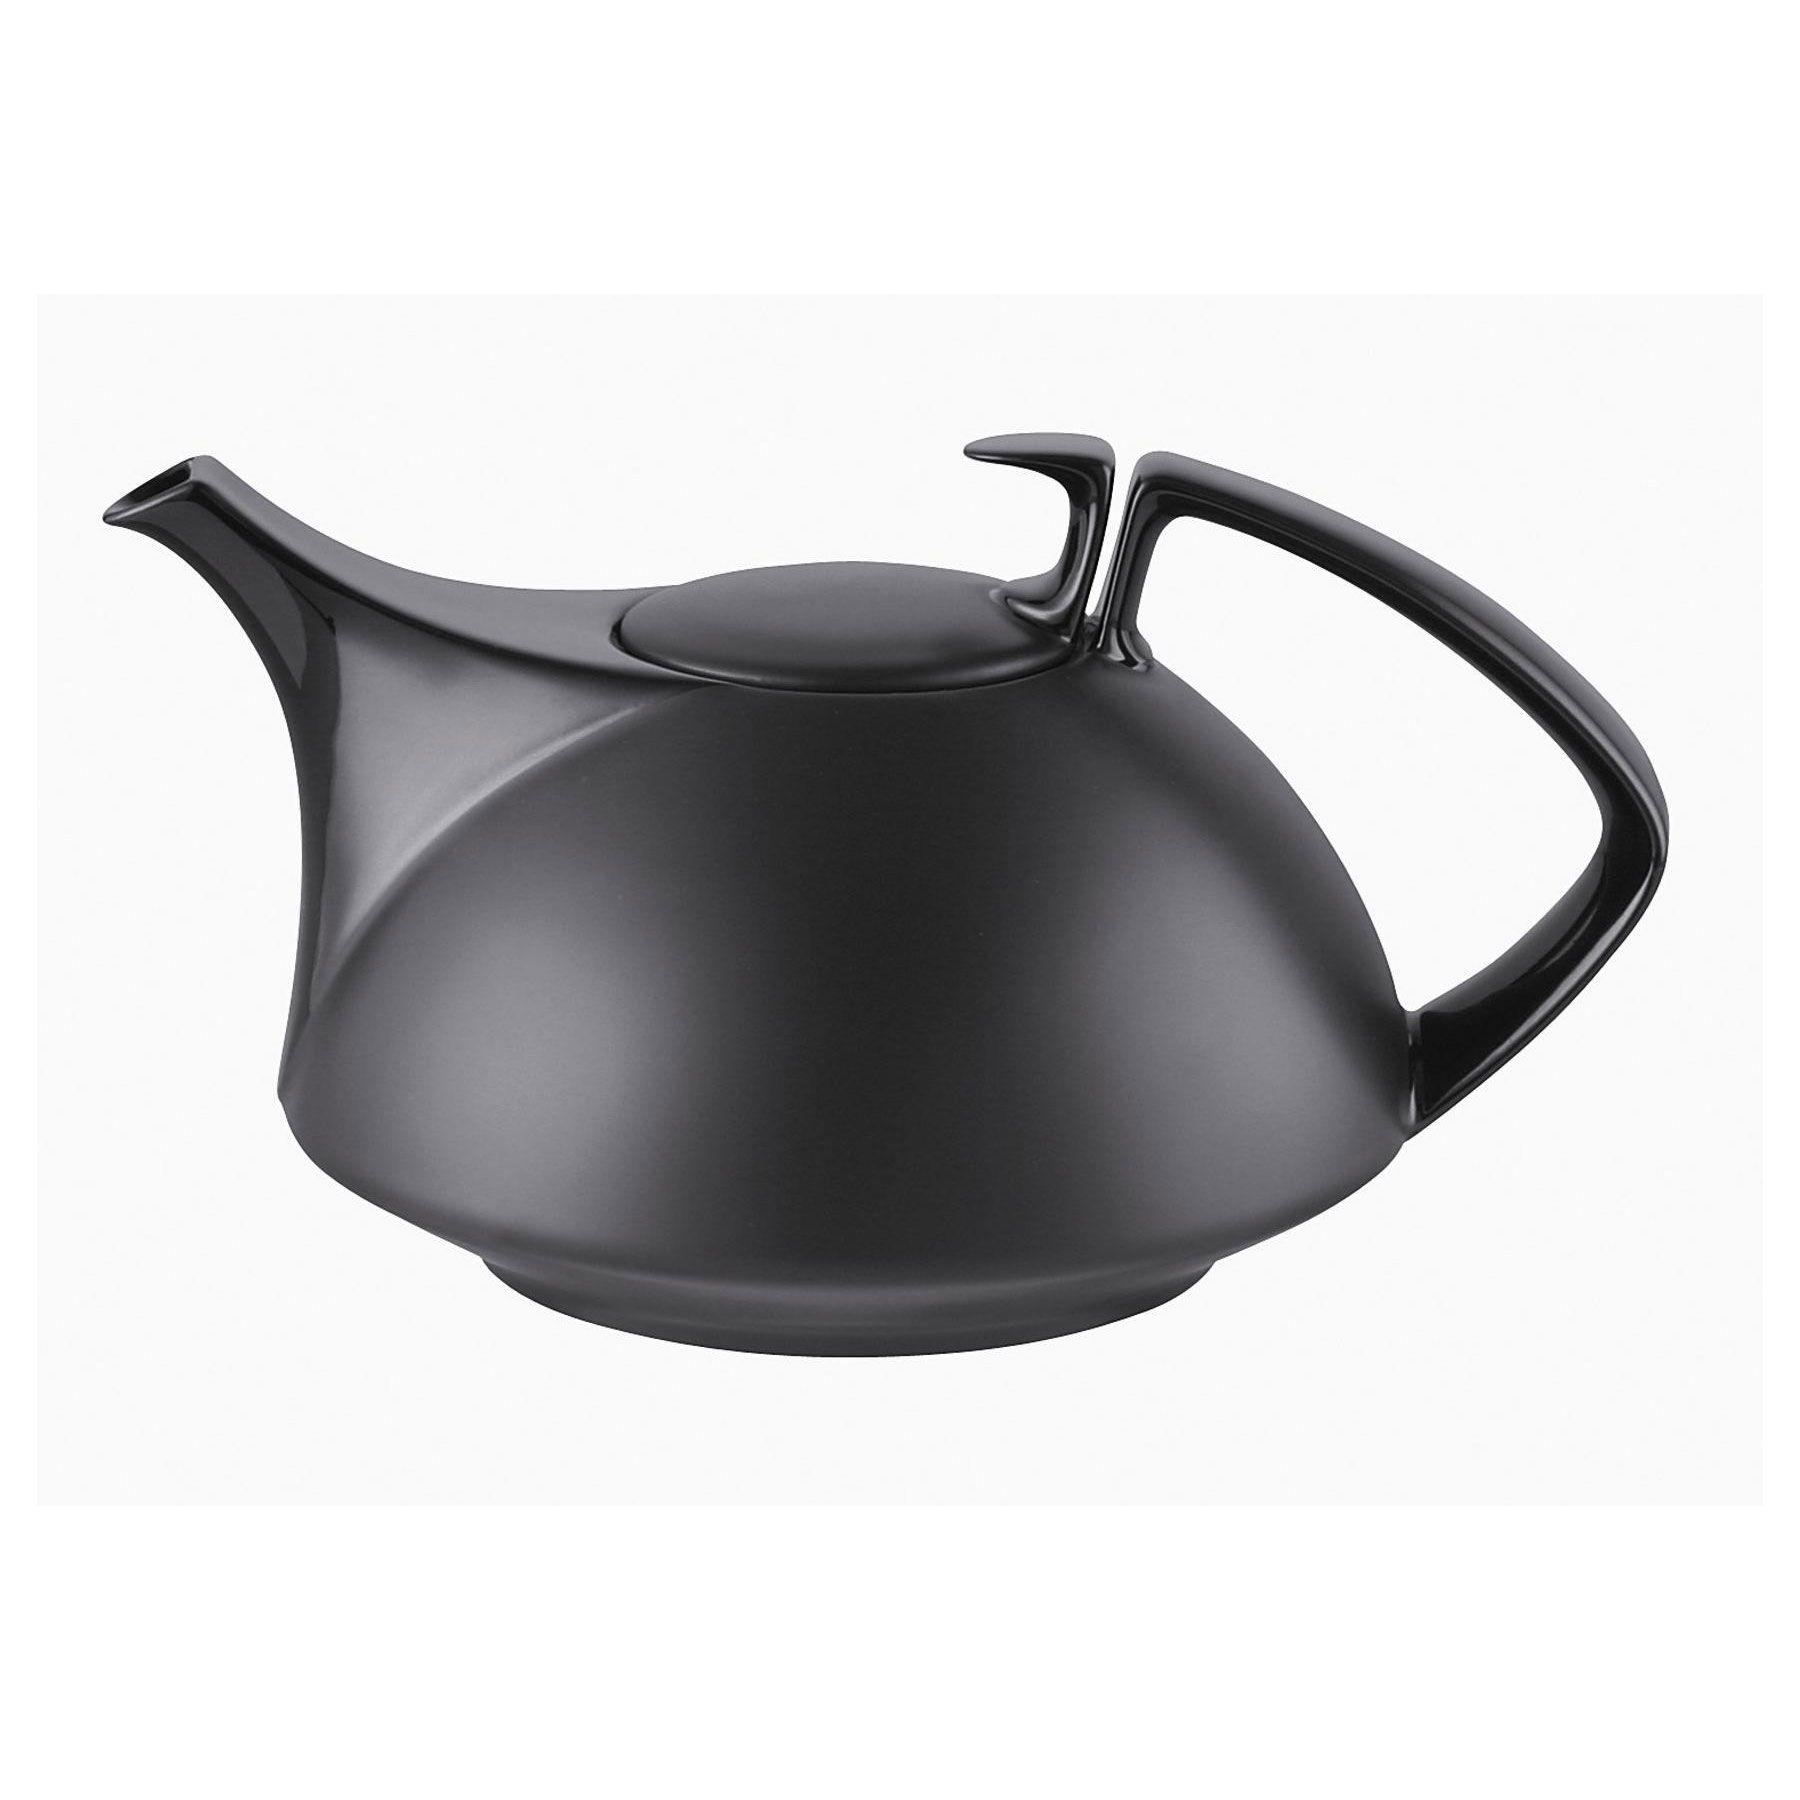 tac black teapot by walter gropius for rosenthal  design  - tac black teapot by walter gropius for rosenthal  design  utensílios pinterest  walter gropius teapot and tea pots